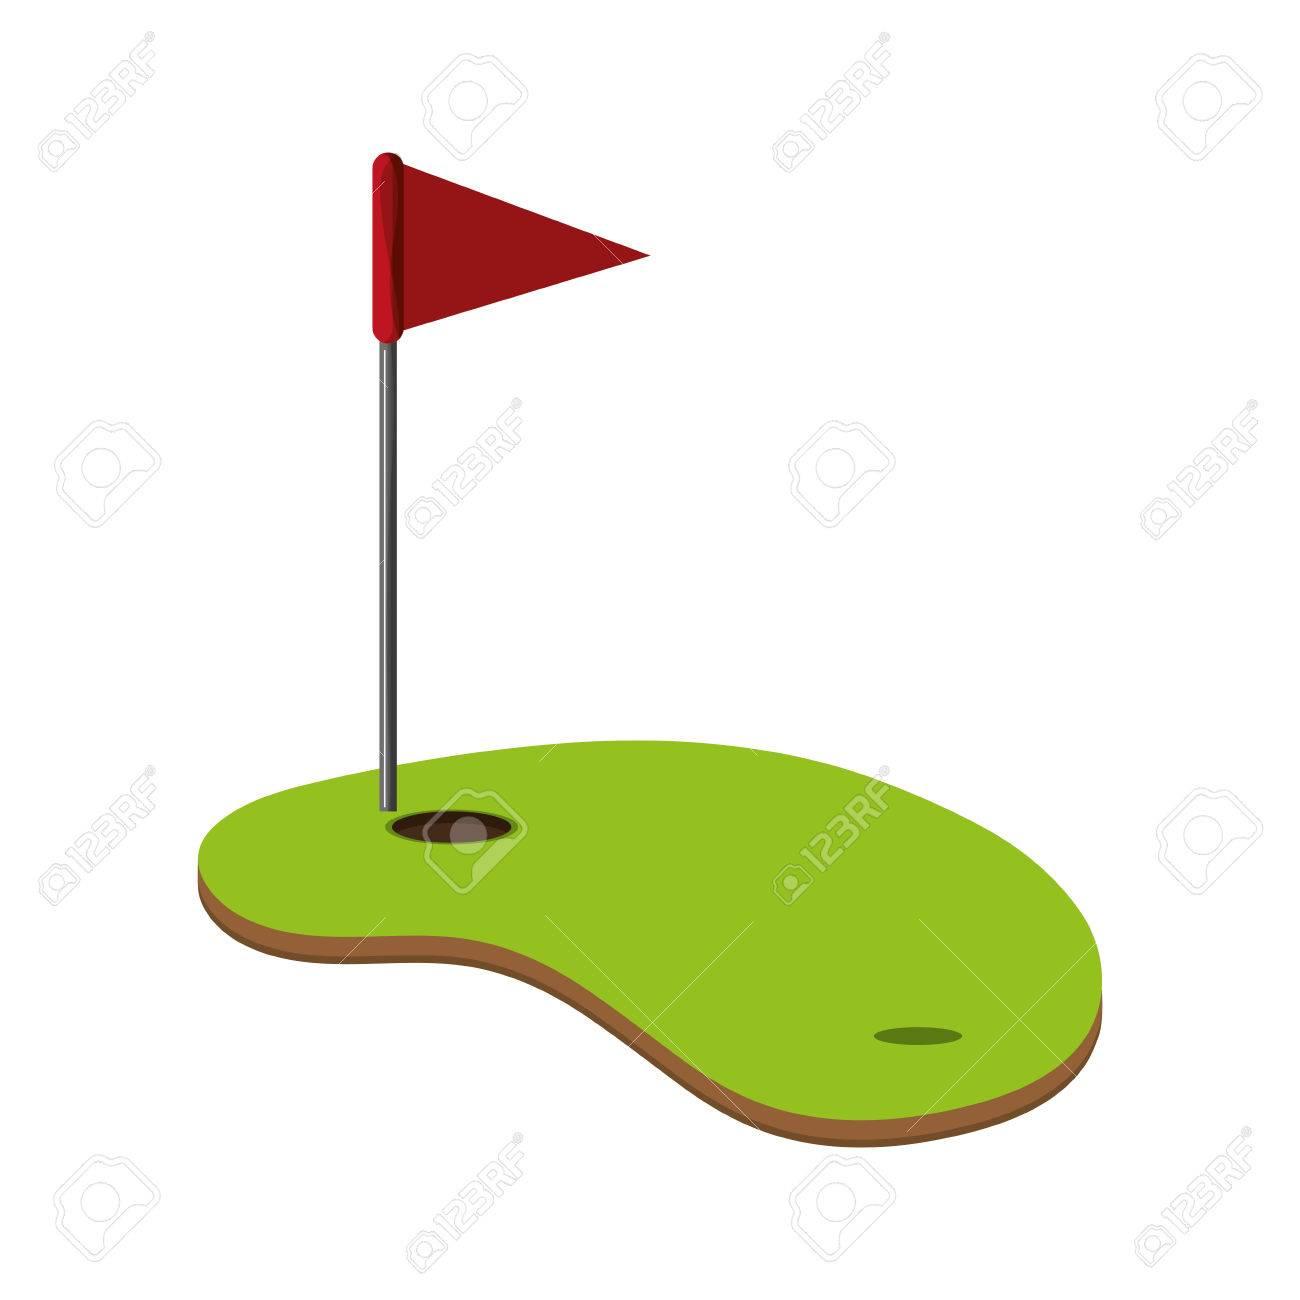 flat design golf hole icon vector illustration - 61271723